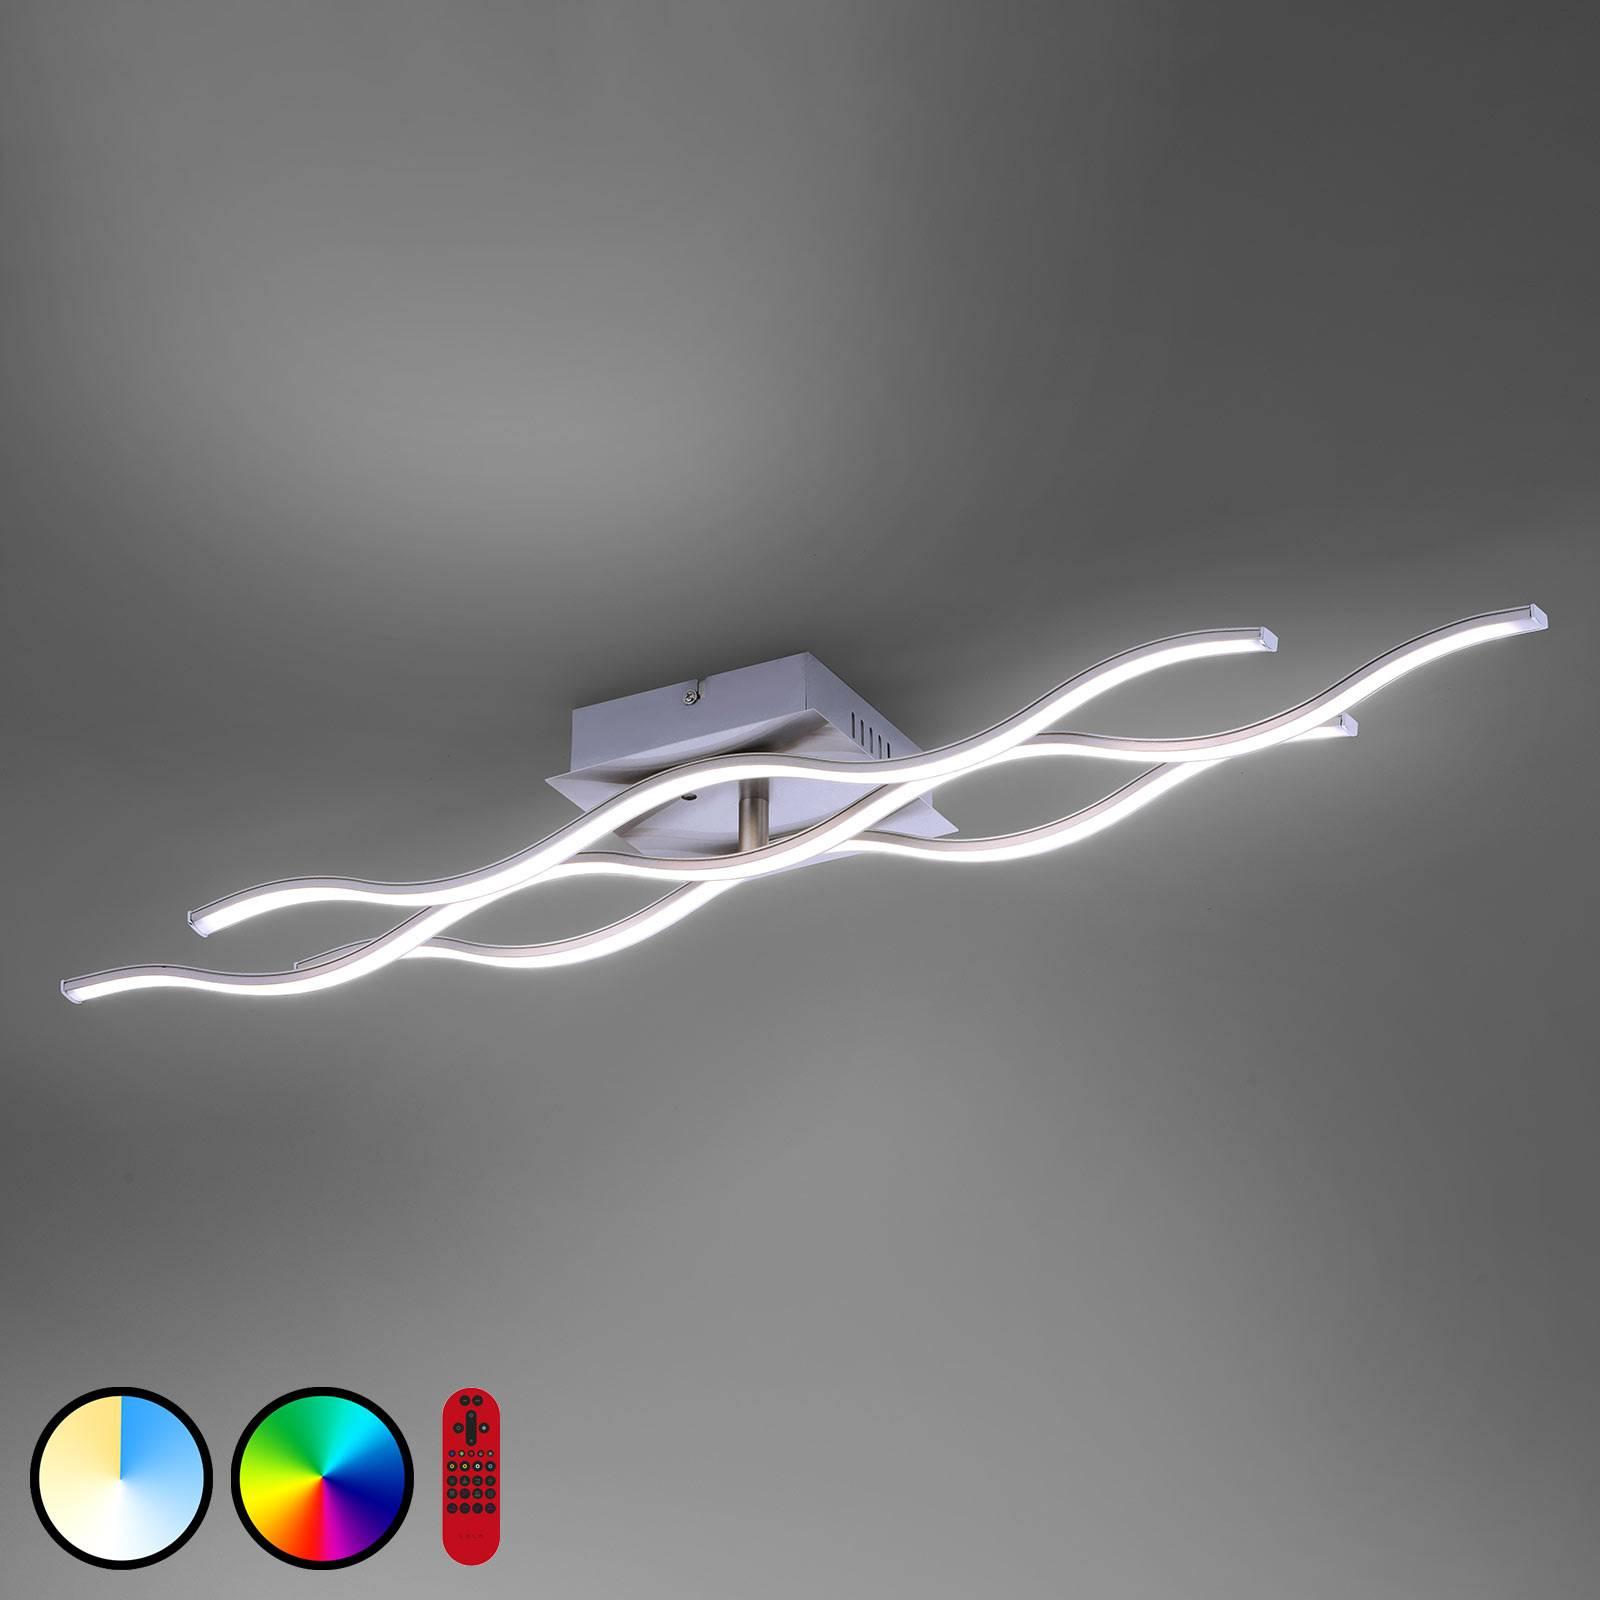 LED plafondlamp LOLAsmart Wave 3-lamps staal